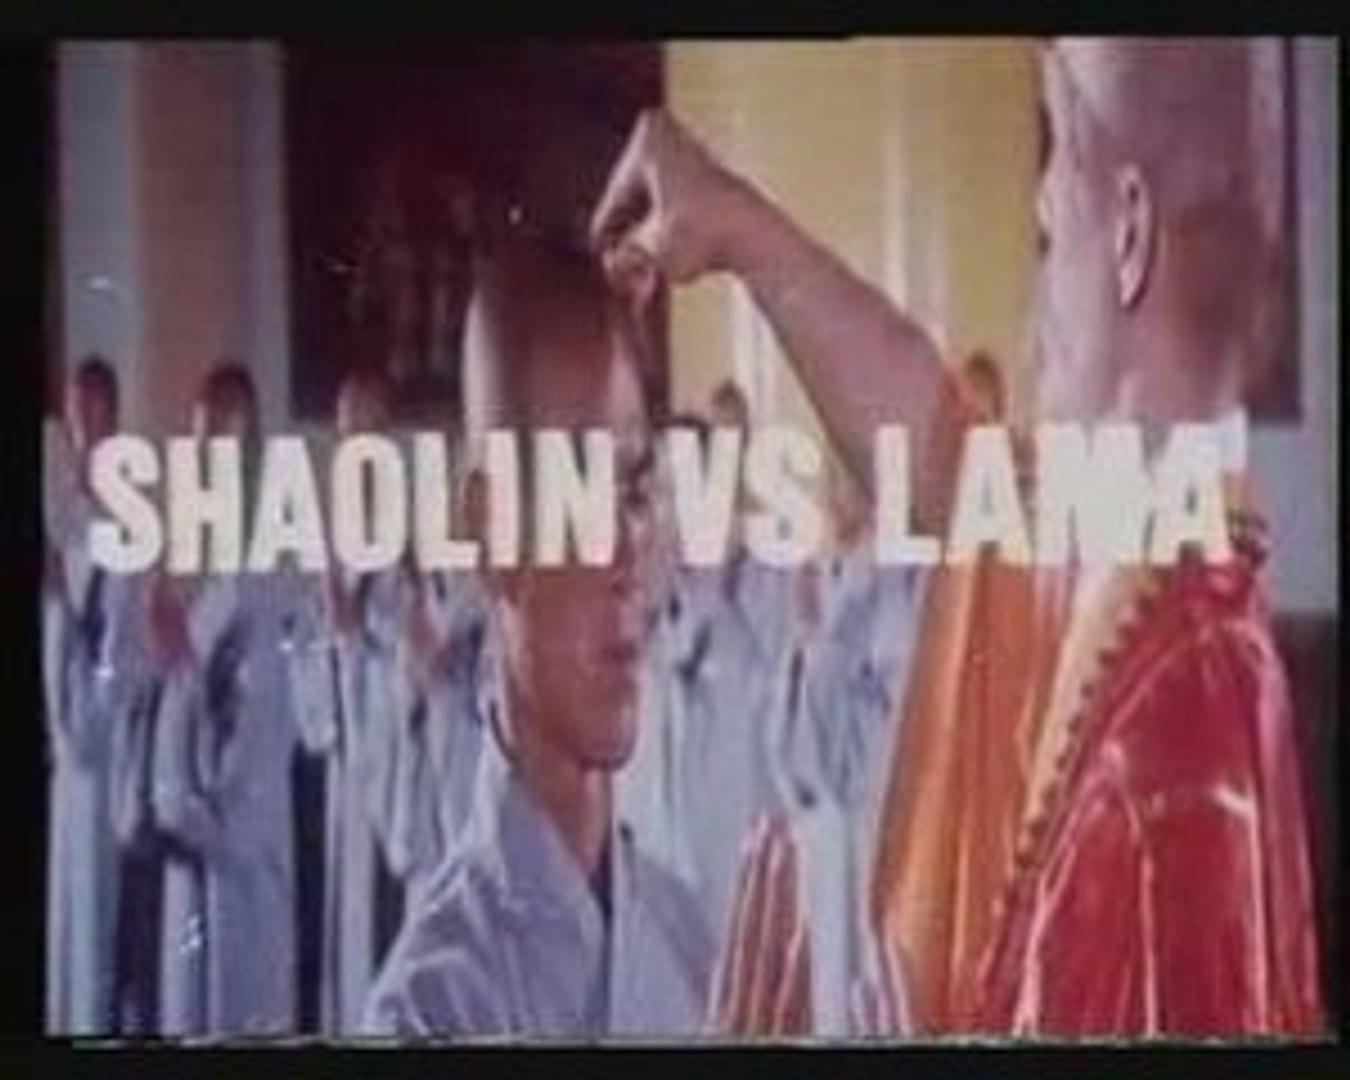 SHAOLIN VS LAMA - kung fu martial arts movie Trailer